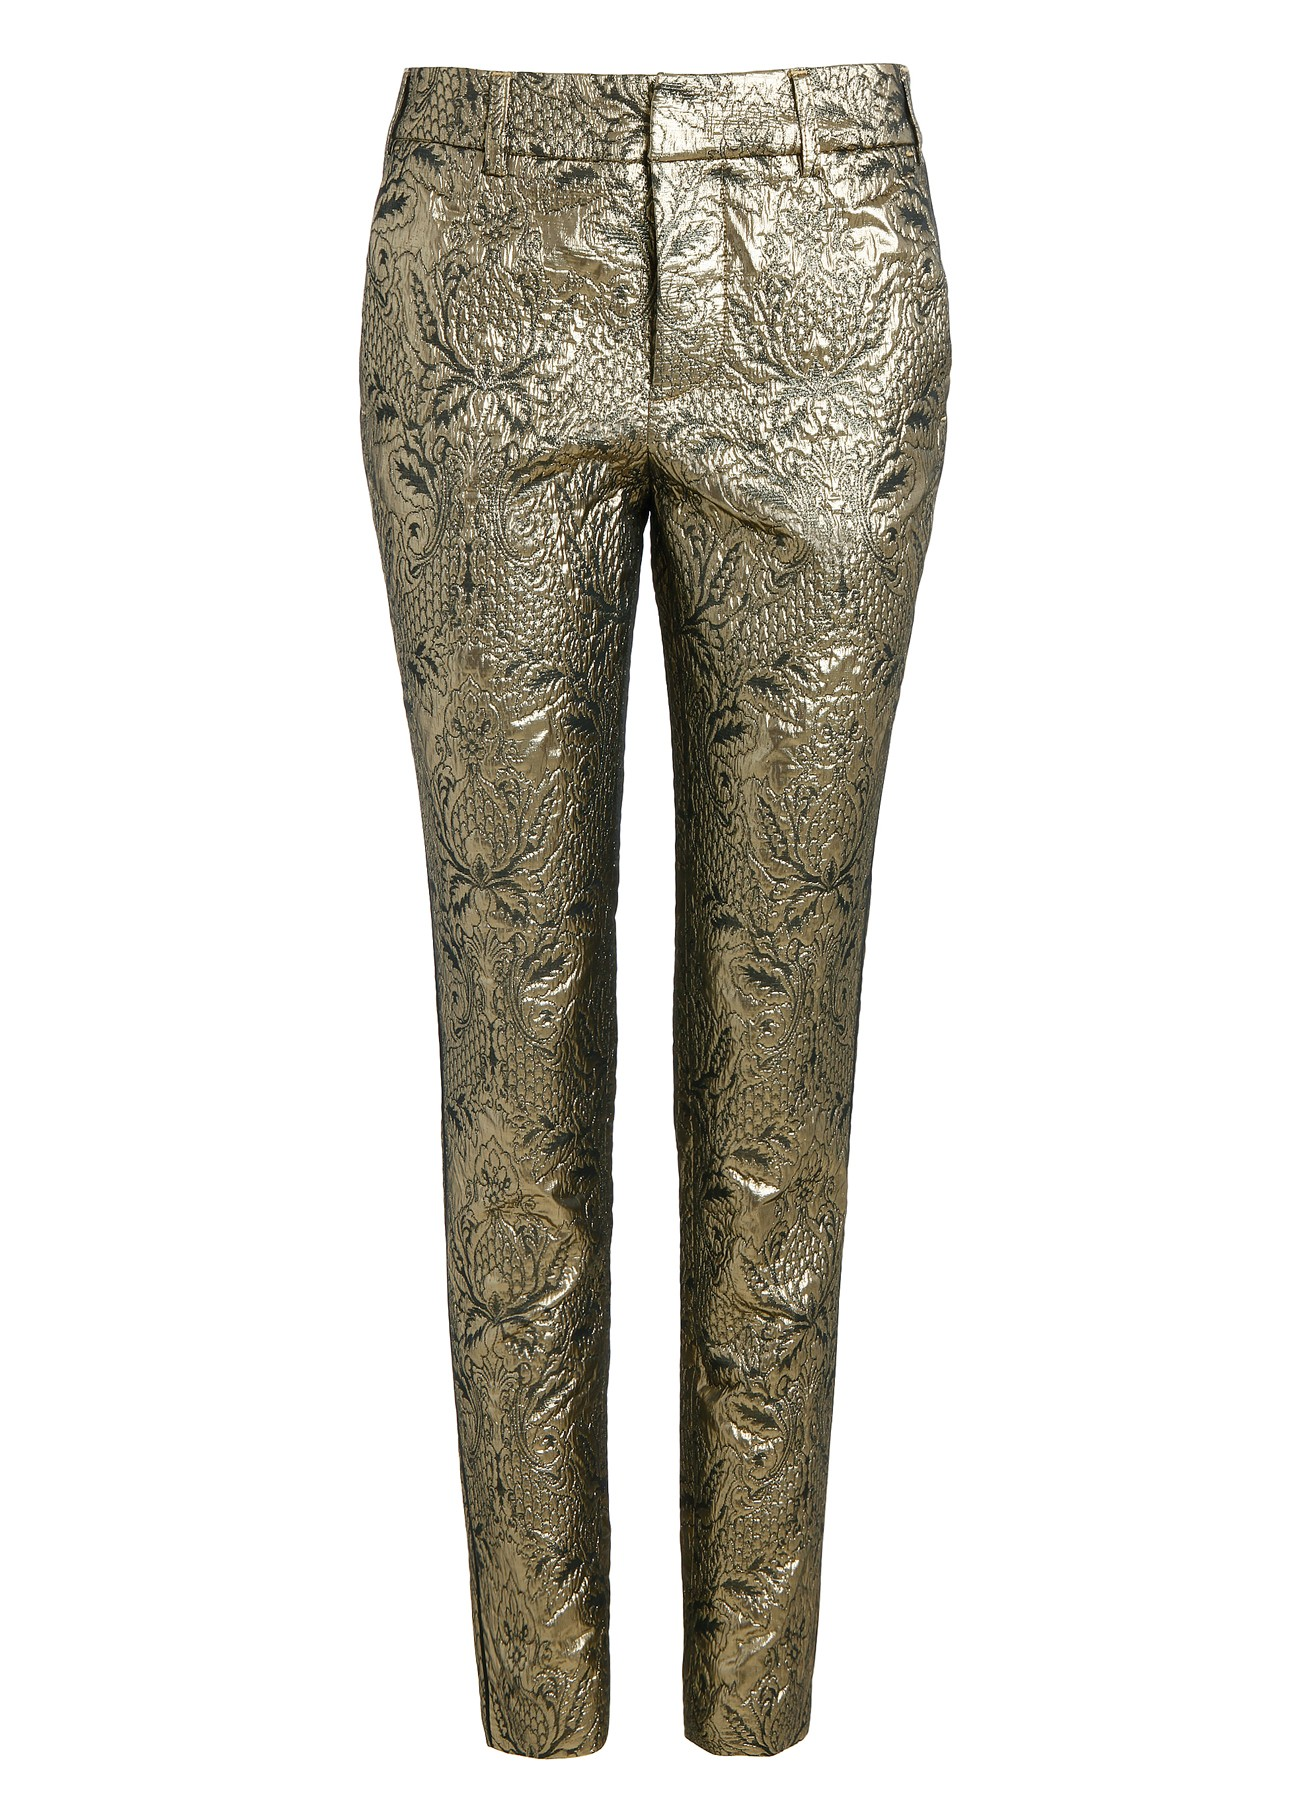 pants for  woman posh dore deluxe gold-Zadig&Voltaire